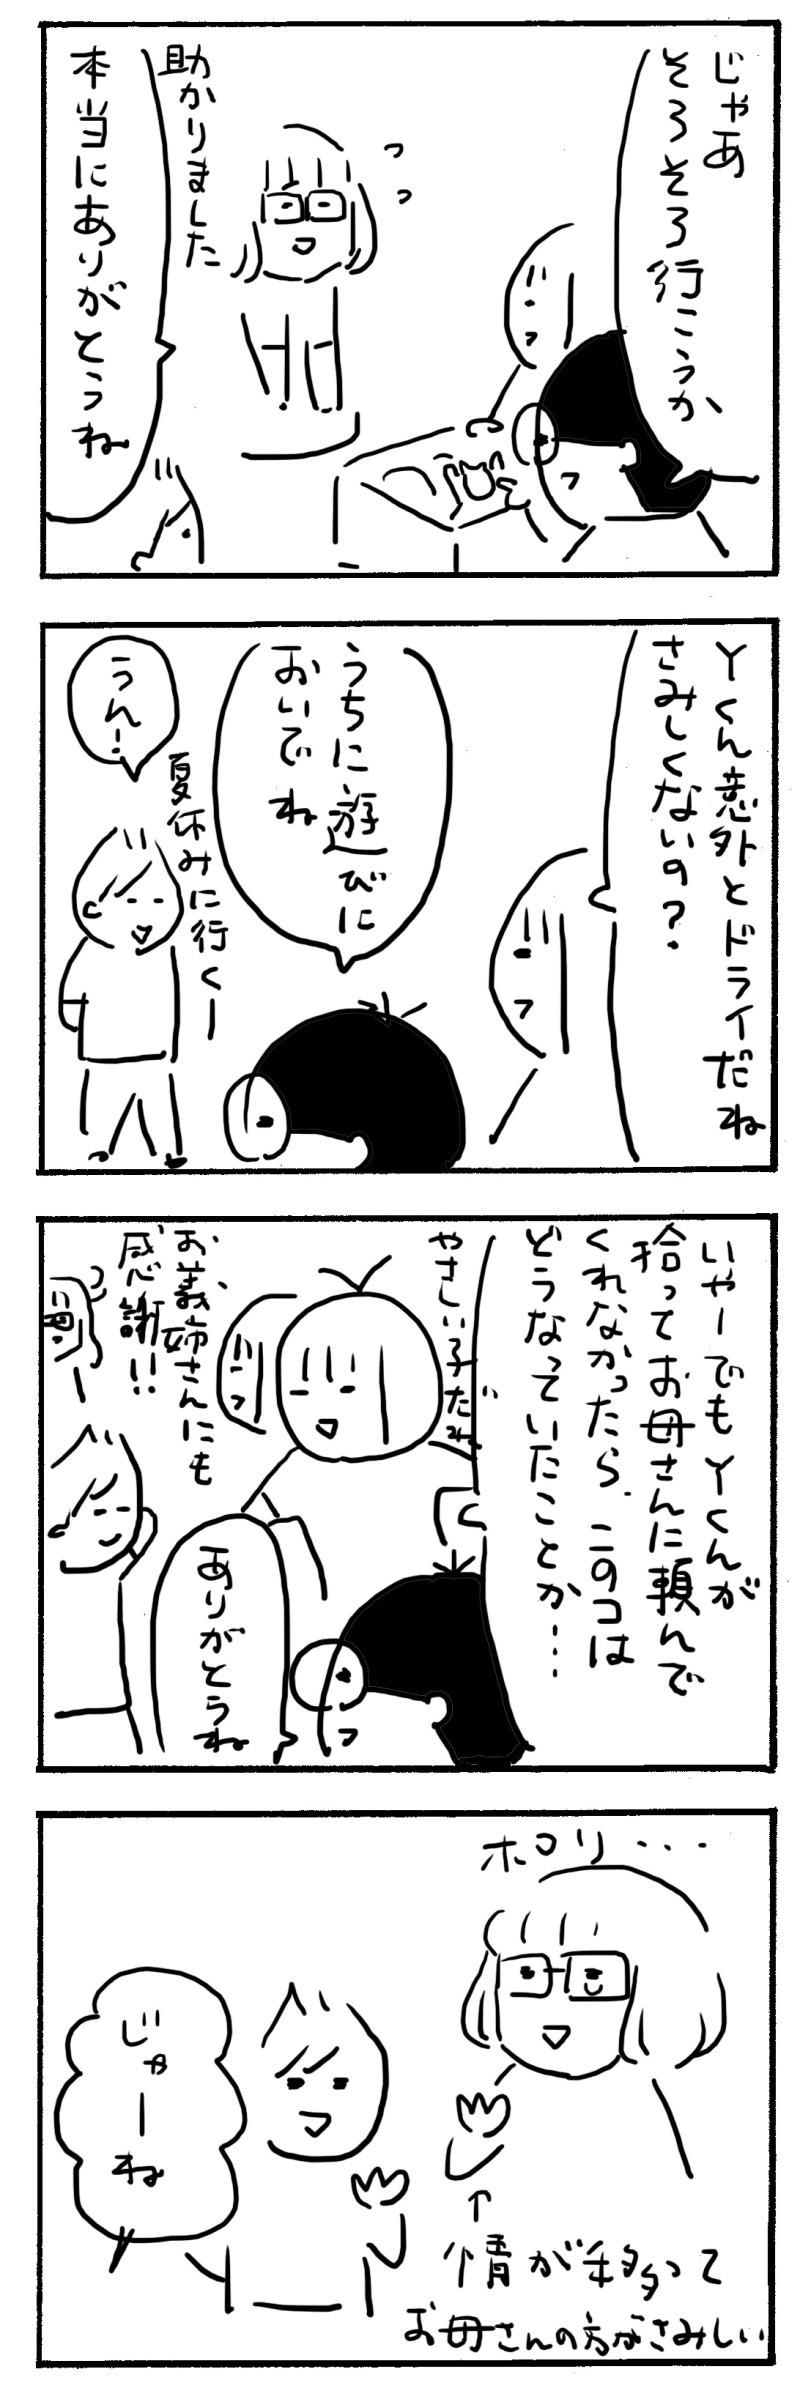 49815e57.jpg